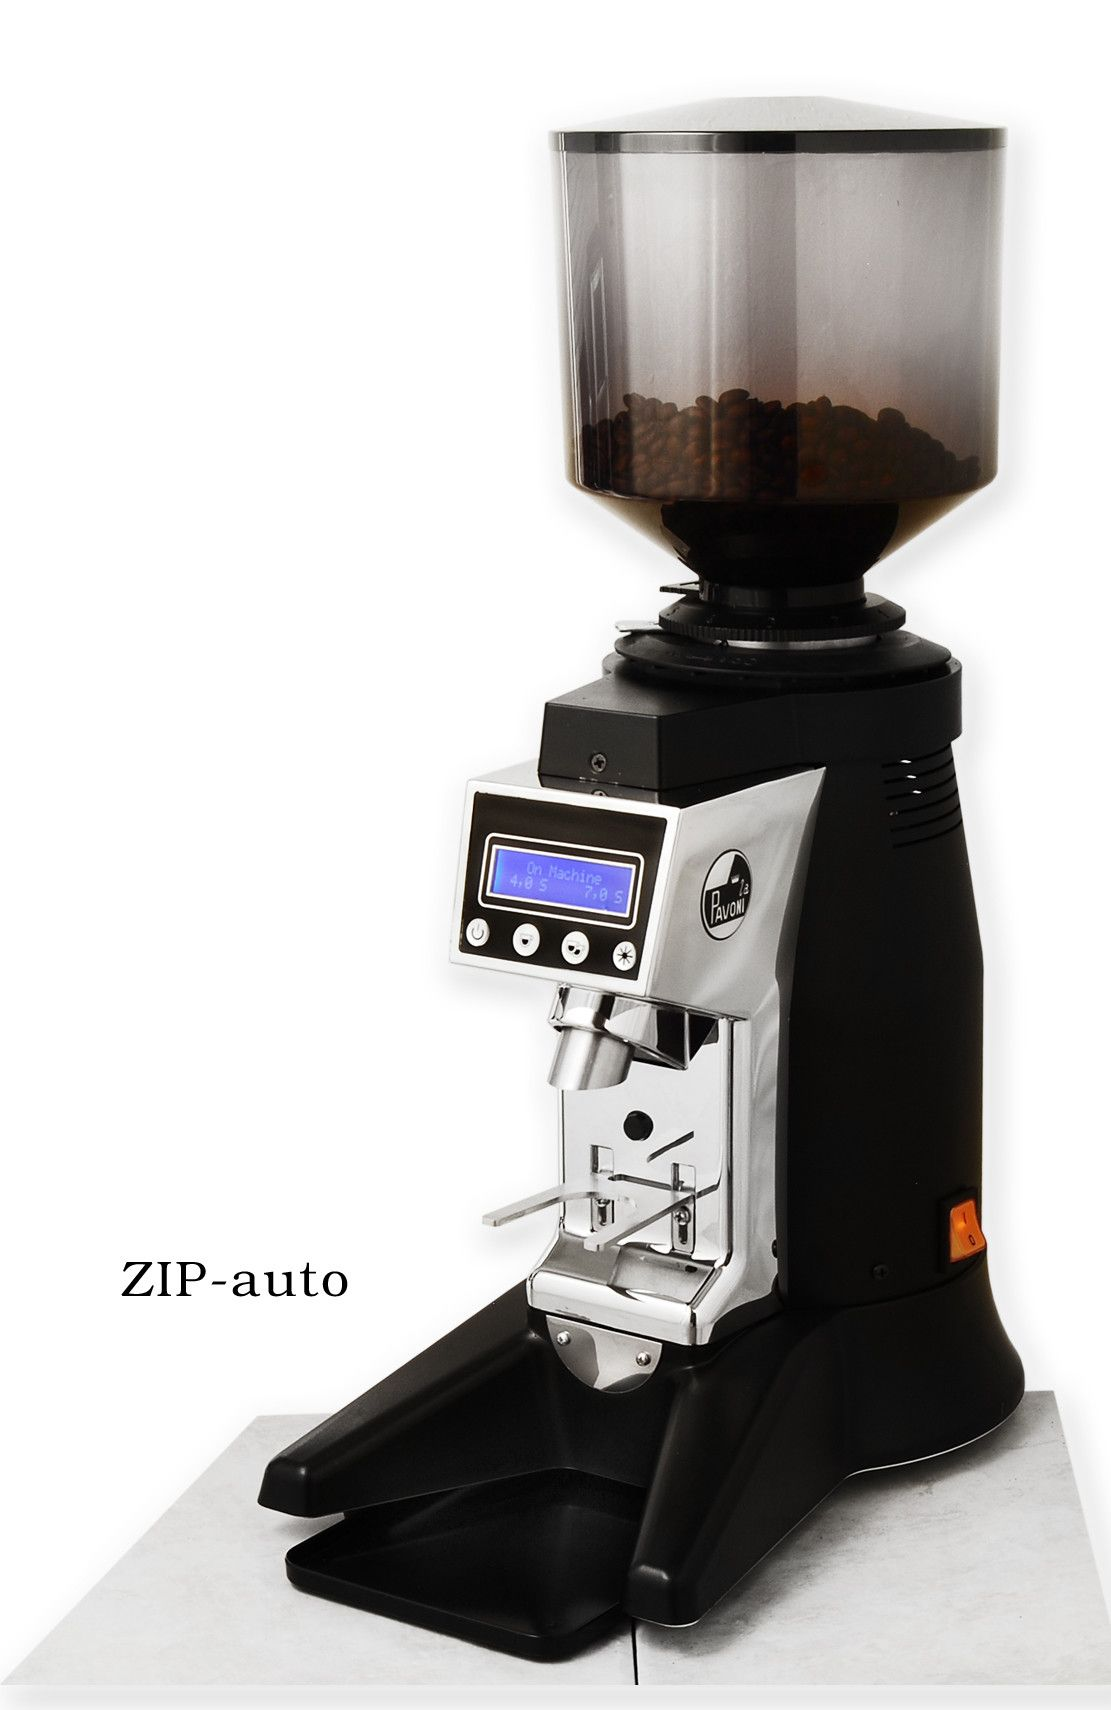 Isomac La Pavoni Electric Burr Coffee Grinder Cappuccino